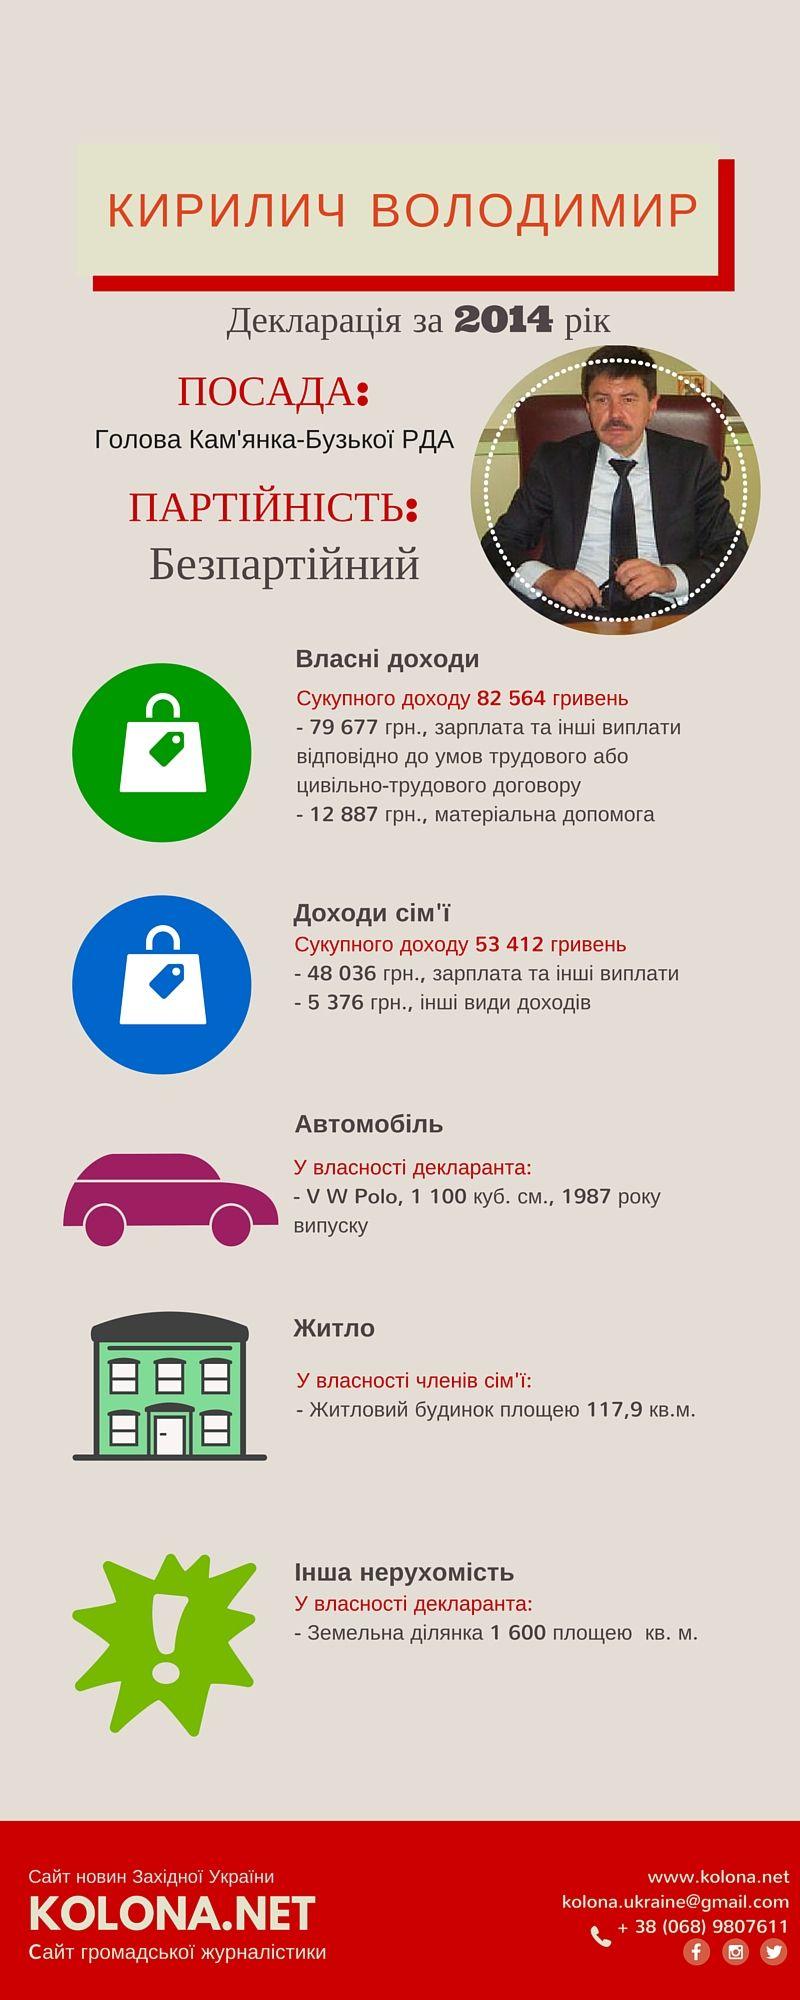 Голова Кам'янка-Бузької РДА – Кирилич Володимир